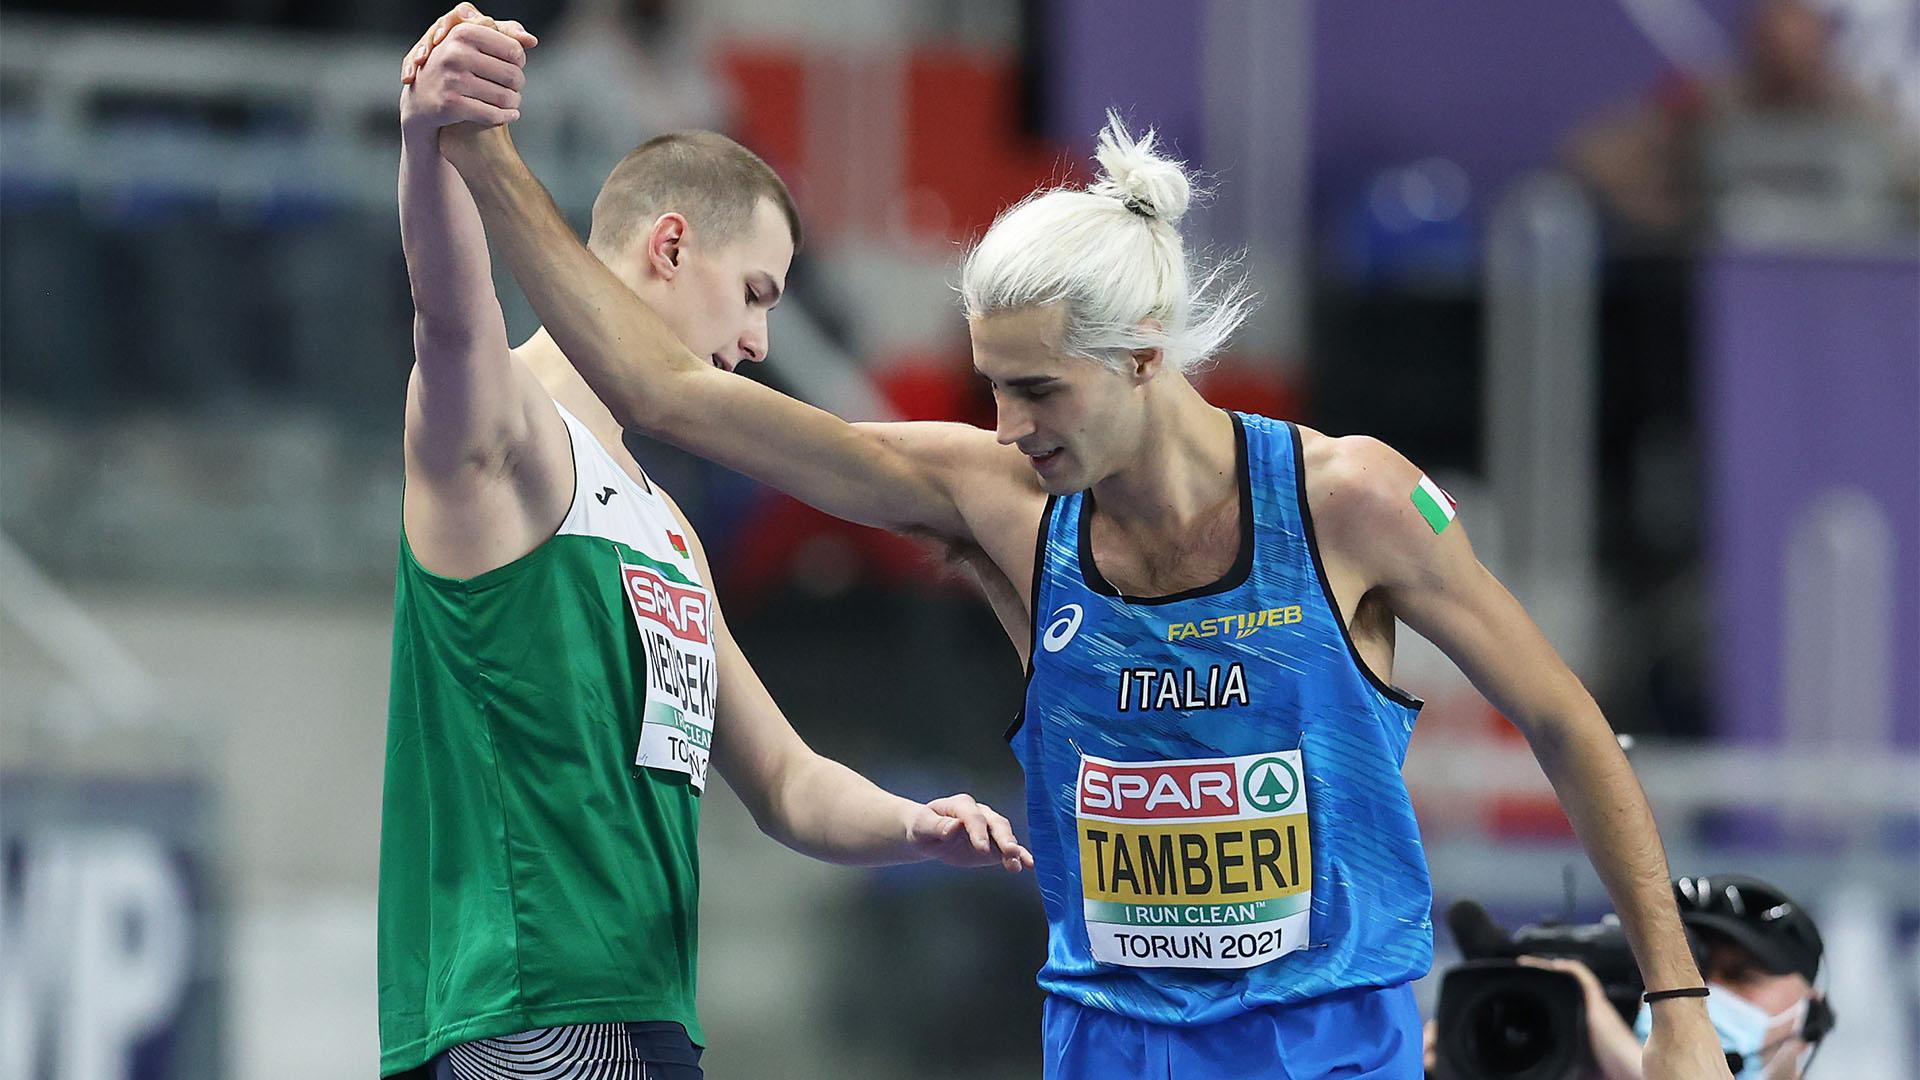 Euroindoor, Gianmarco Tamberi vince l'argento nel salto in alto